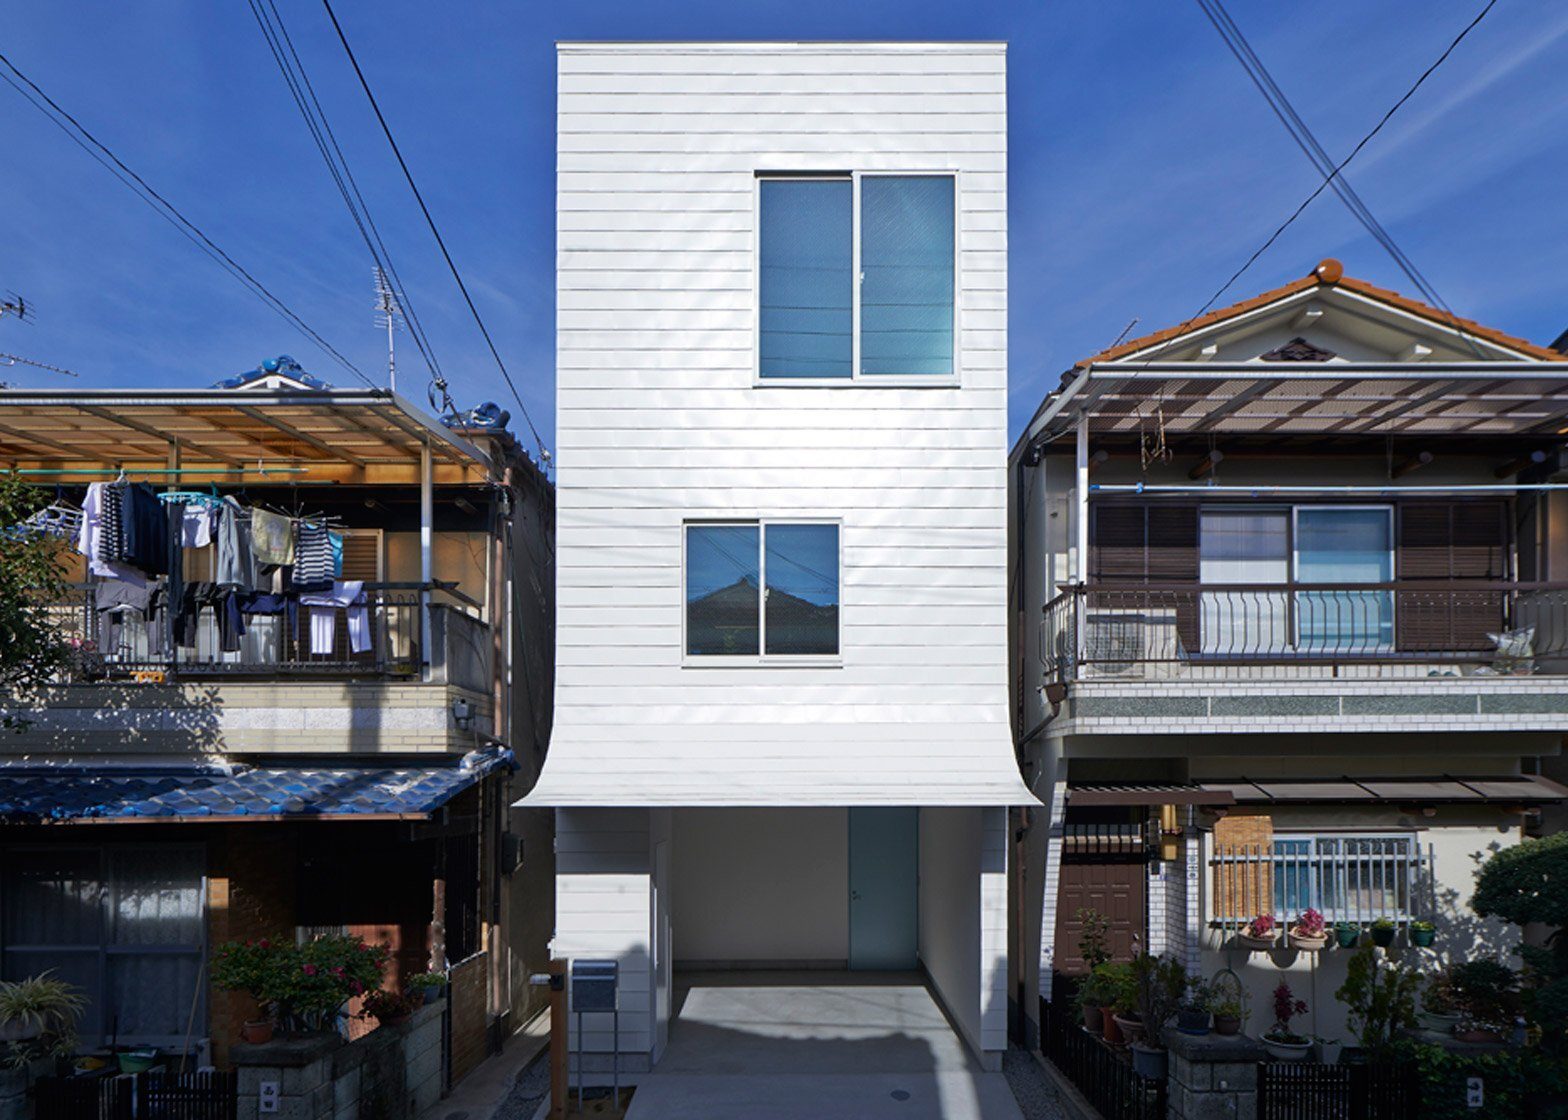 Gandare House - A Narrow Japanese Home by Ninkipen!